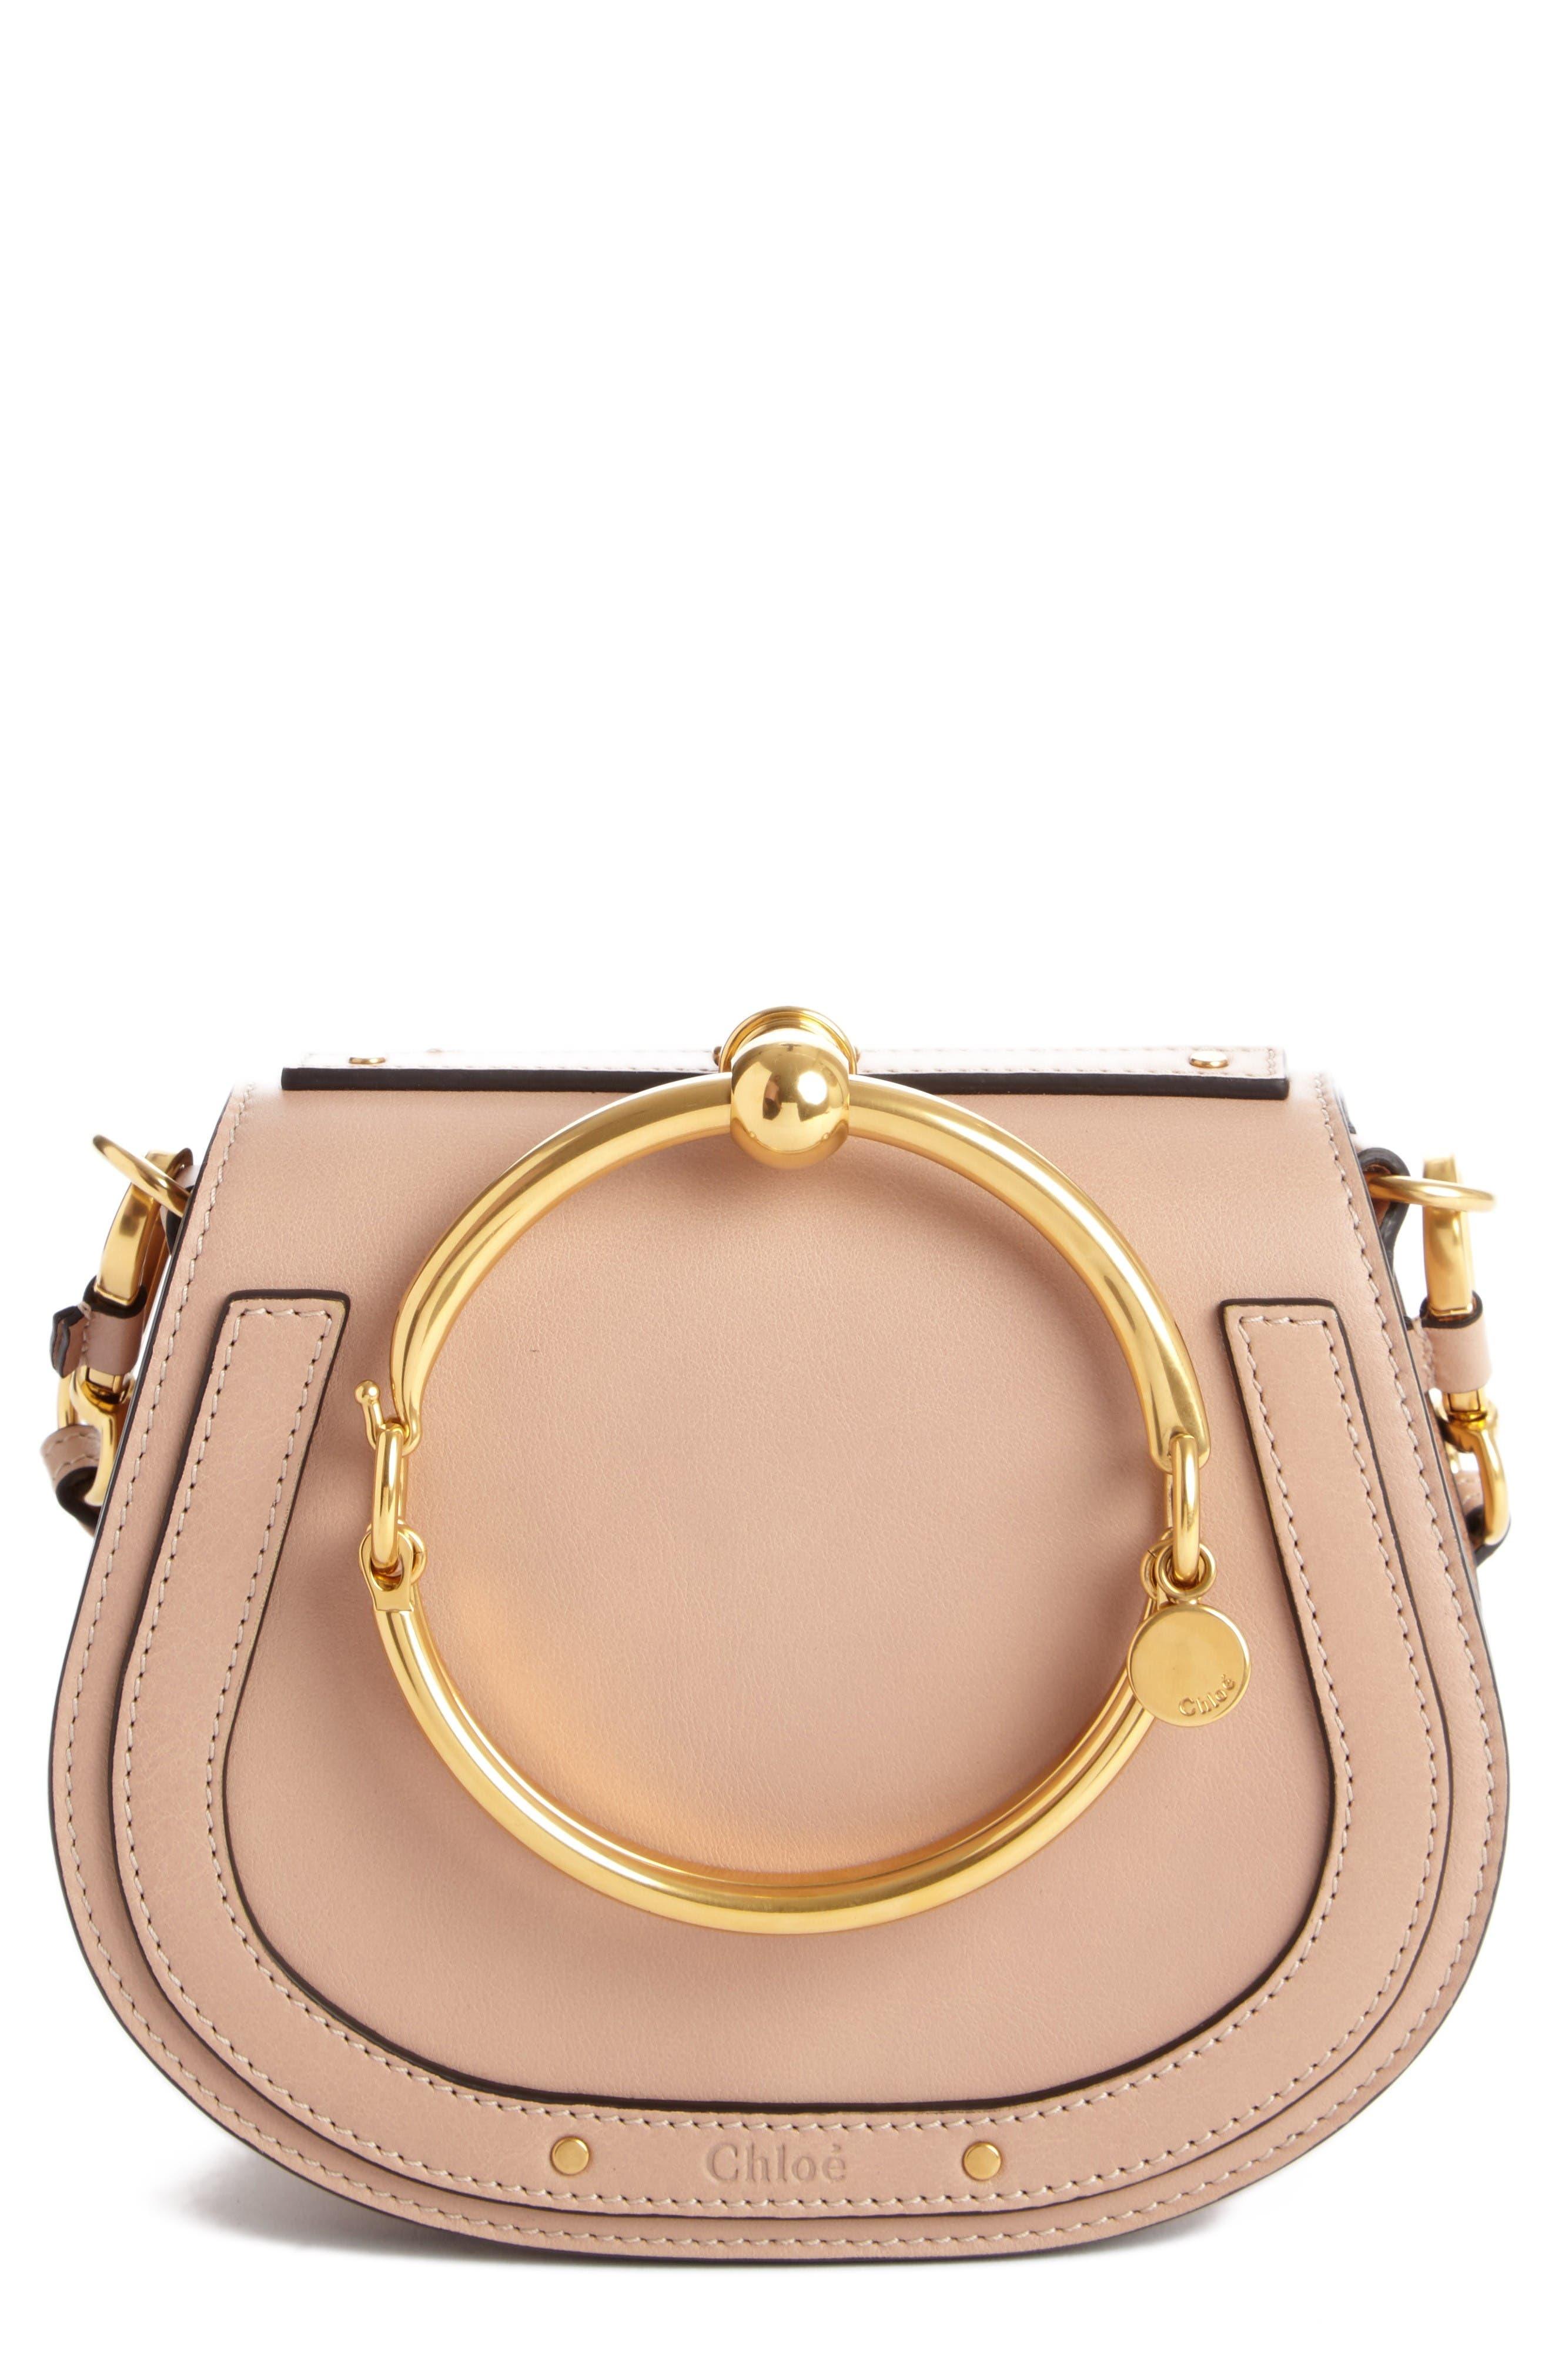 Alternate Image 1 Selected - Chloé Small Nile Bracelet Leather Crossbody Bag